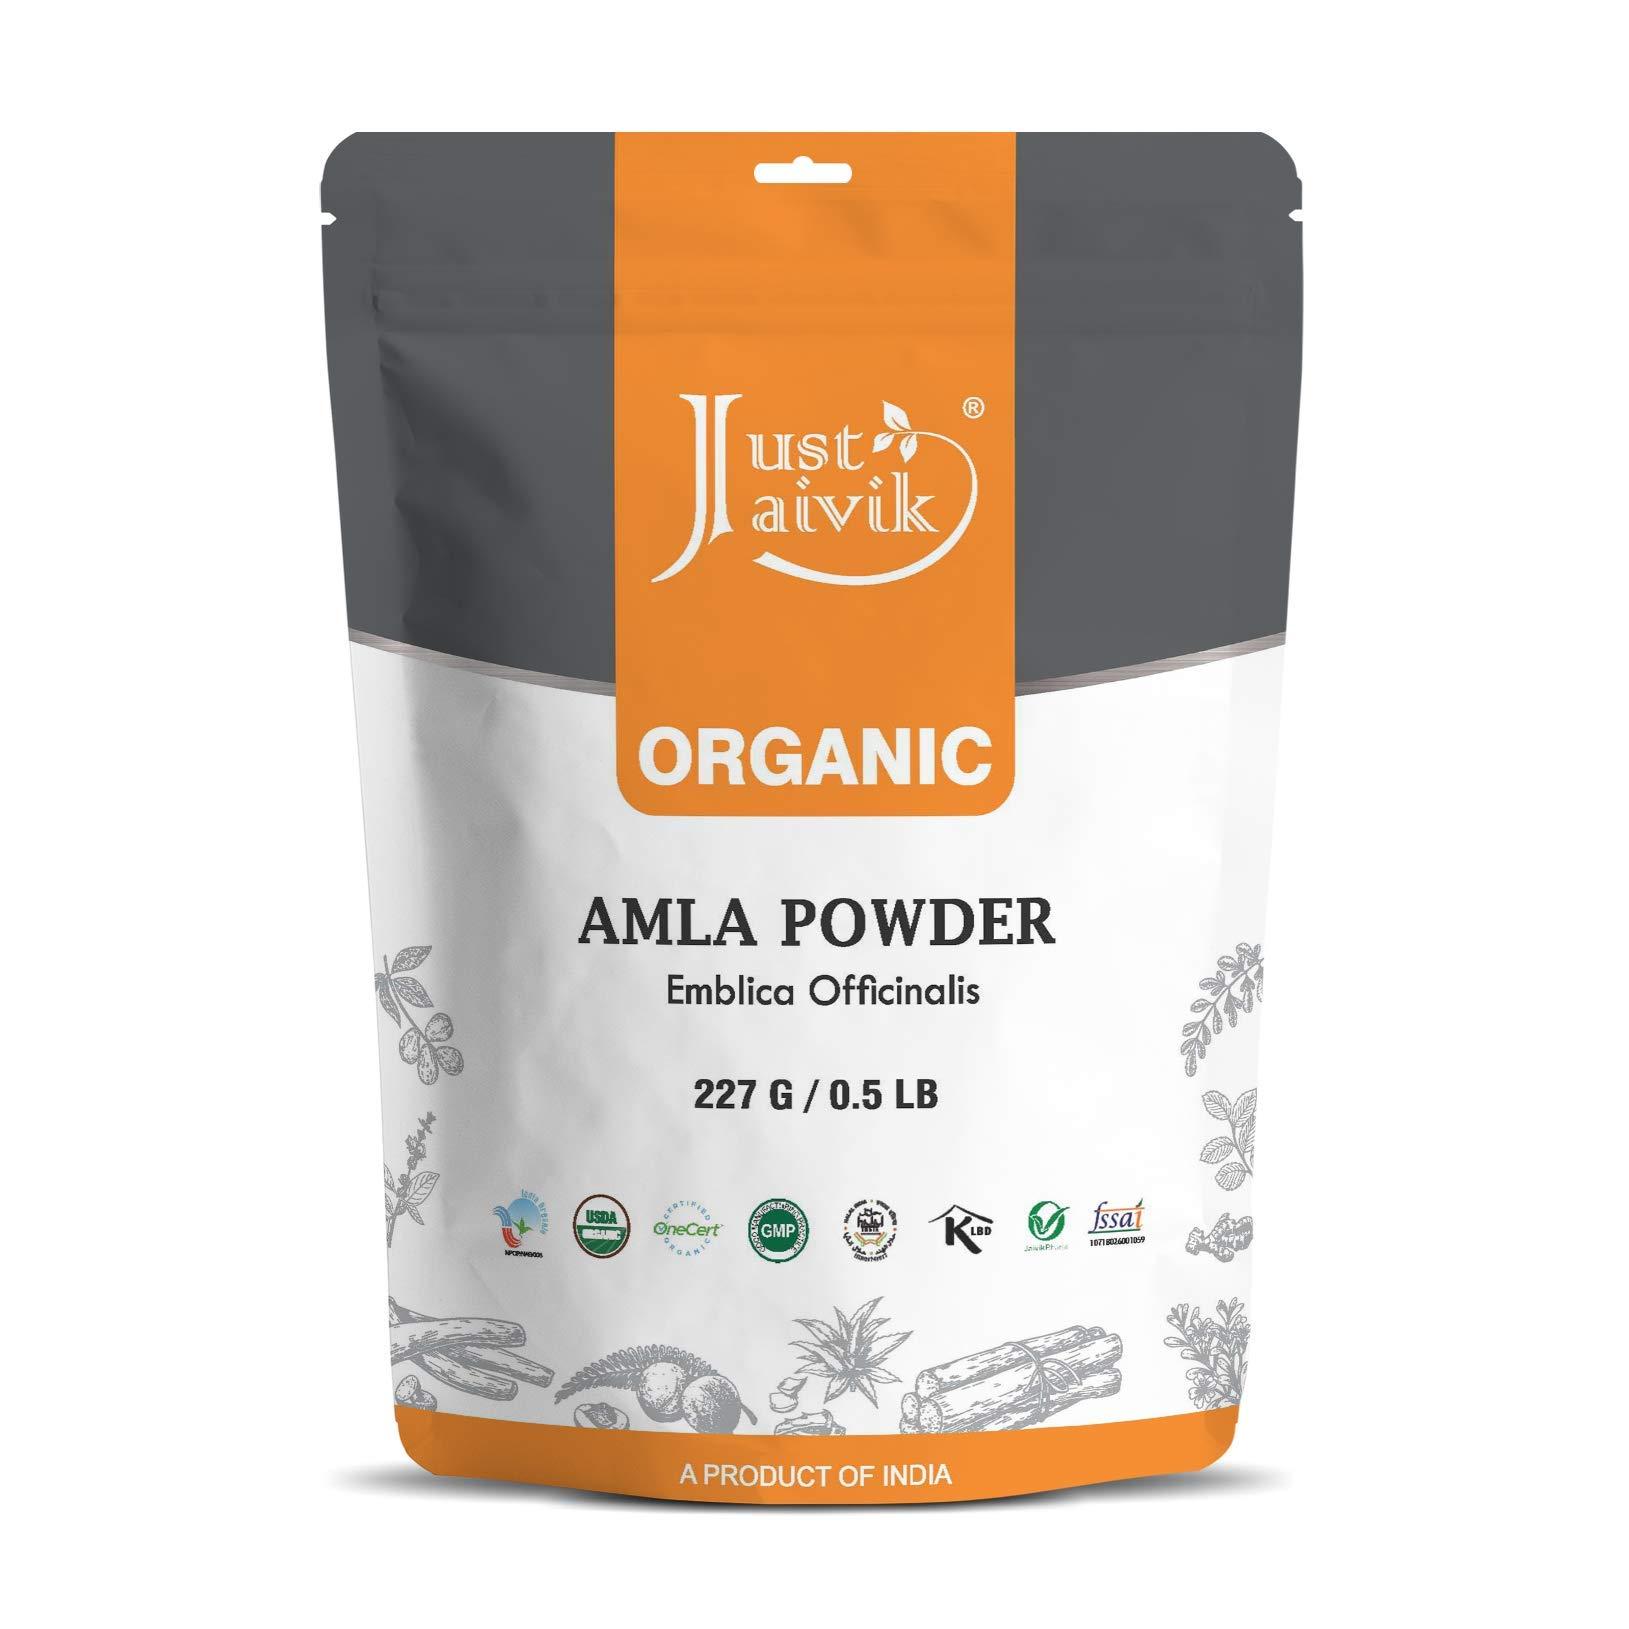 Just Jaivik 100% Organic Amla Powder - Certified Organic by OneCert Asia , 227 GMS / 1/2 LB Pound / 08 Oz - Indian Gooseberry - Emblica Officinalis - (an USDA Organic Certified Herb)